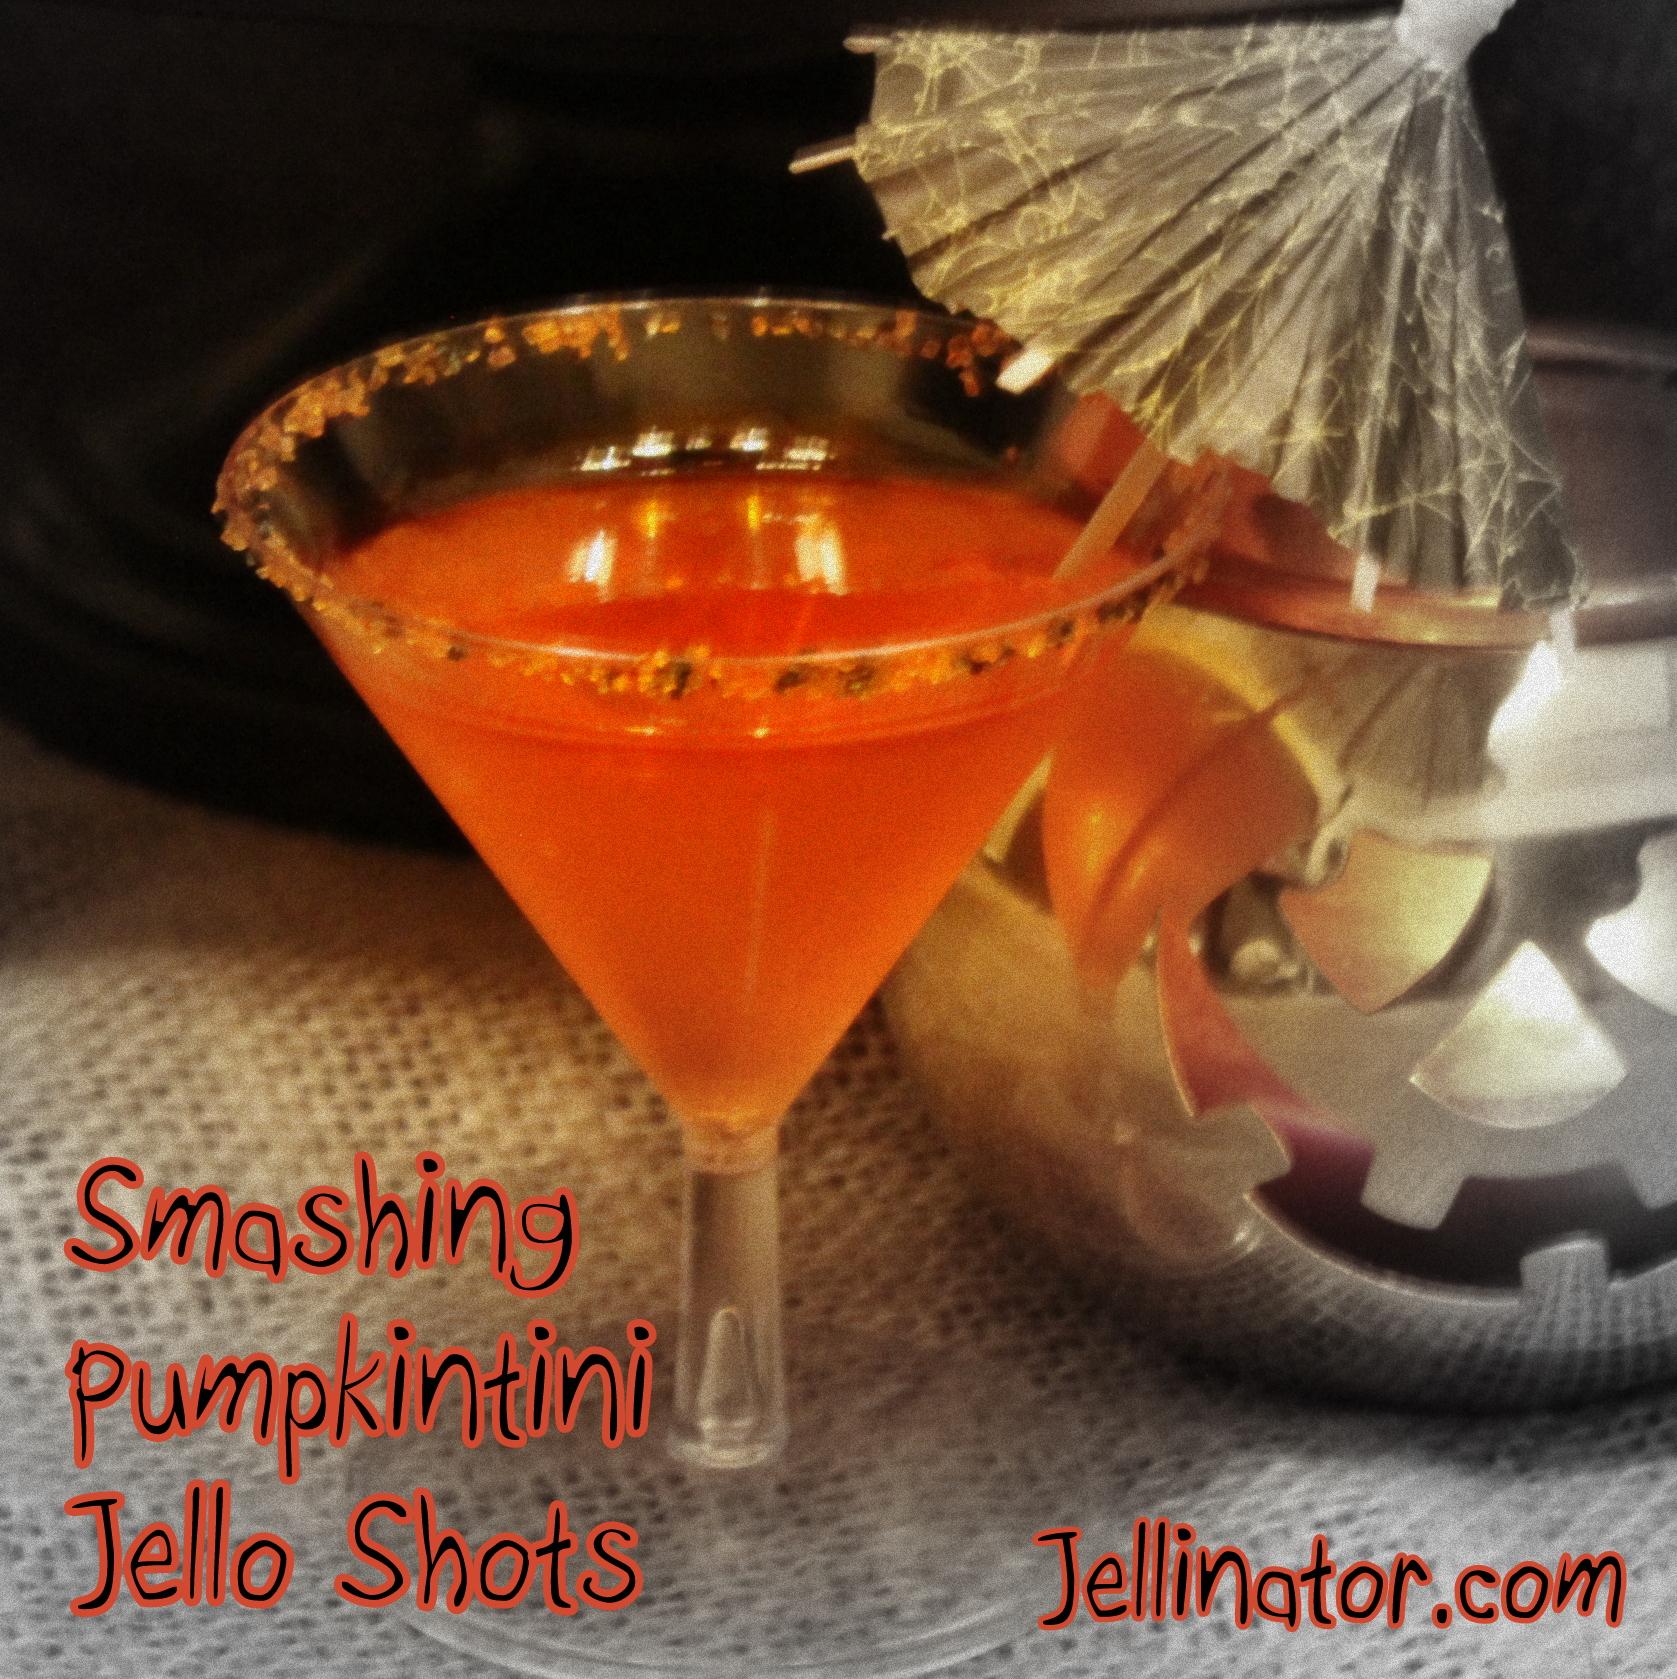 Halloween Party Recipes | Jellinator